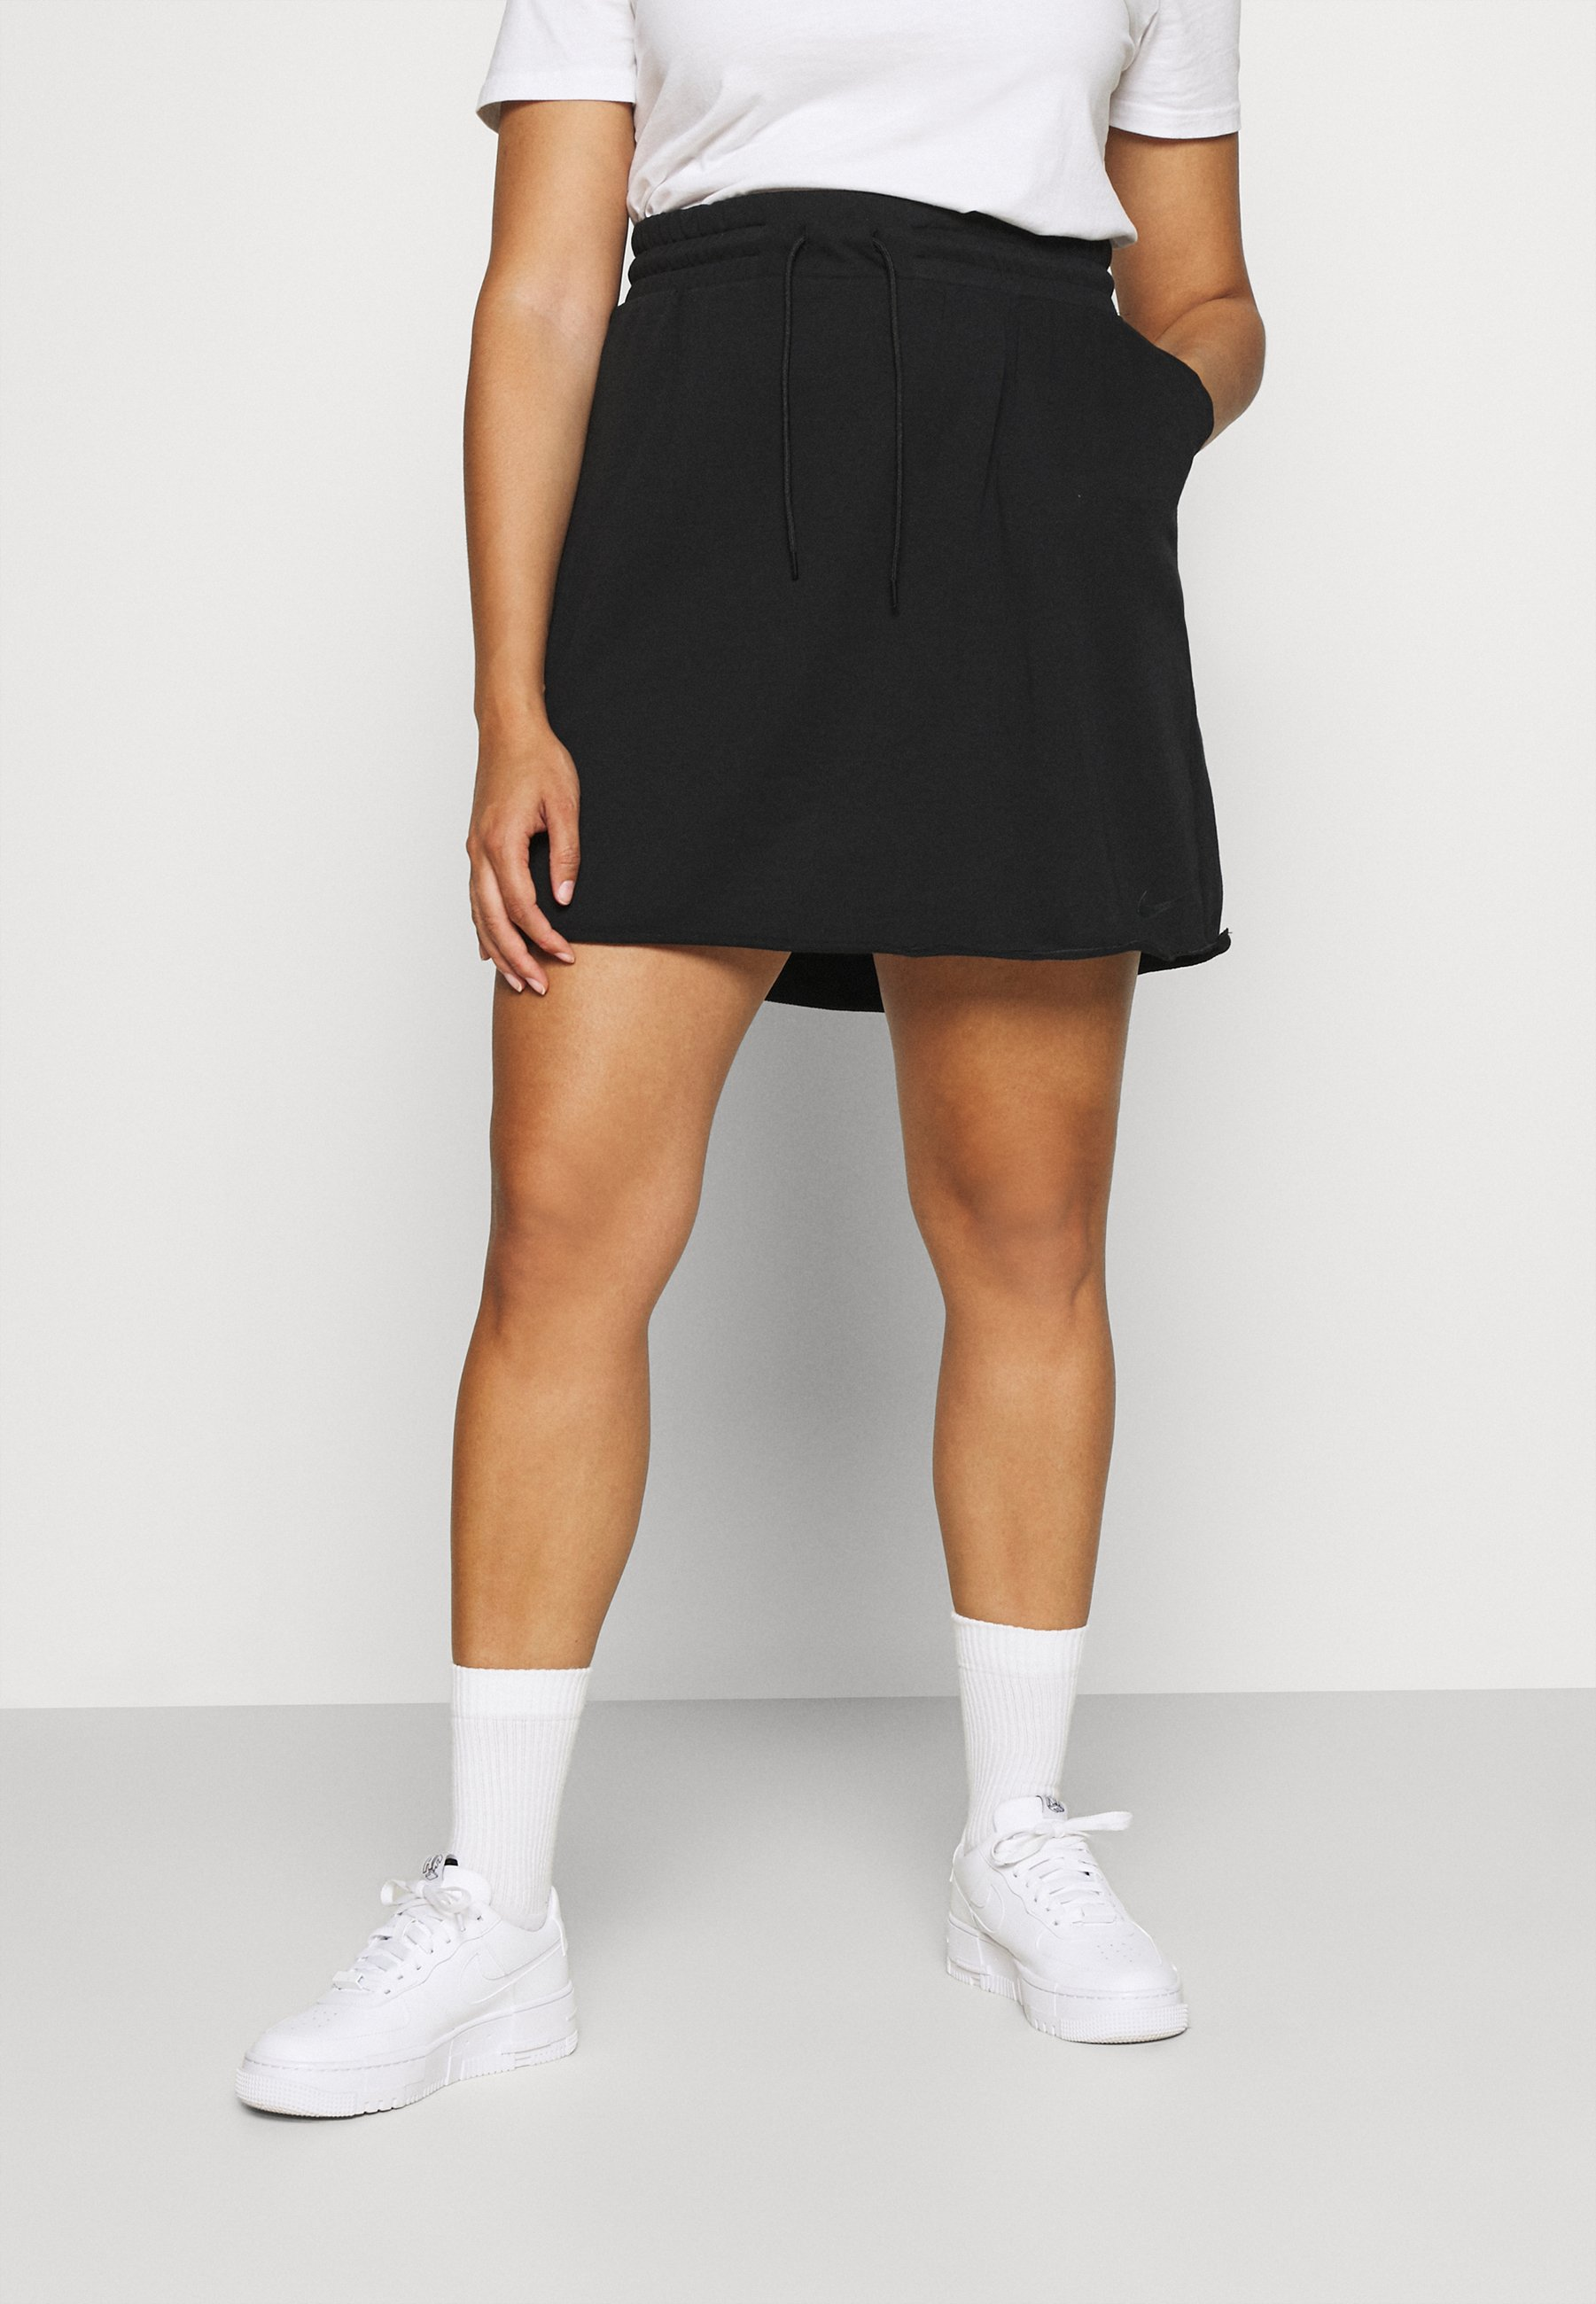 Femme CLASH SKIRT - Minijupe